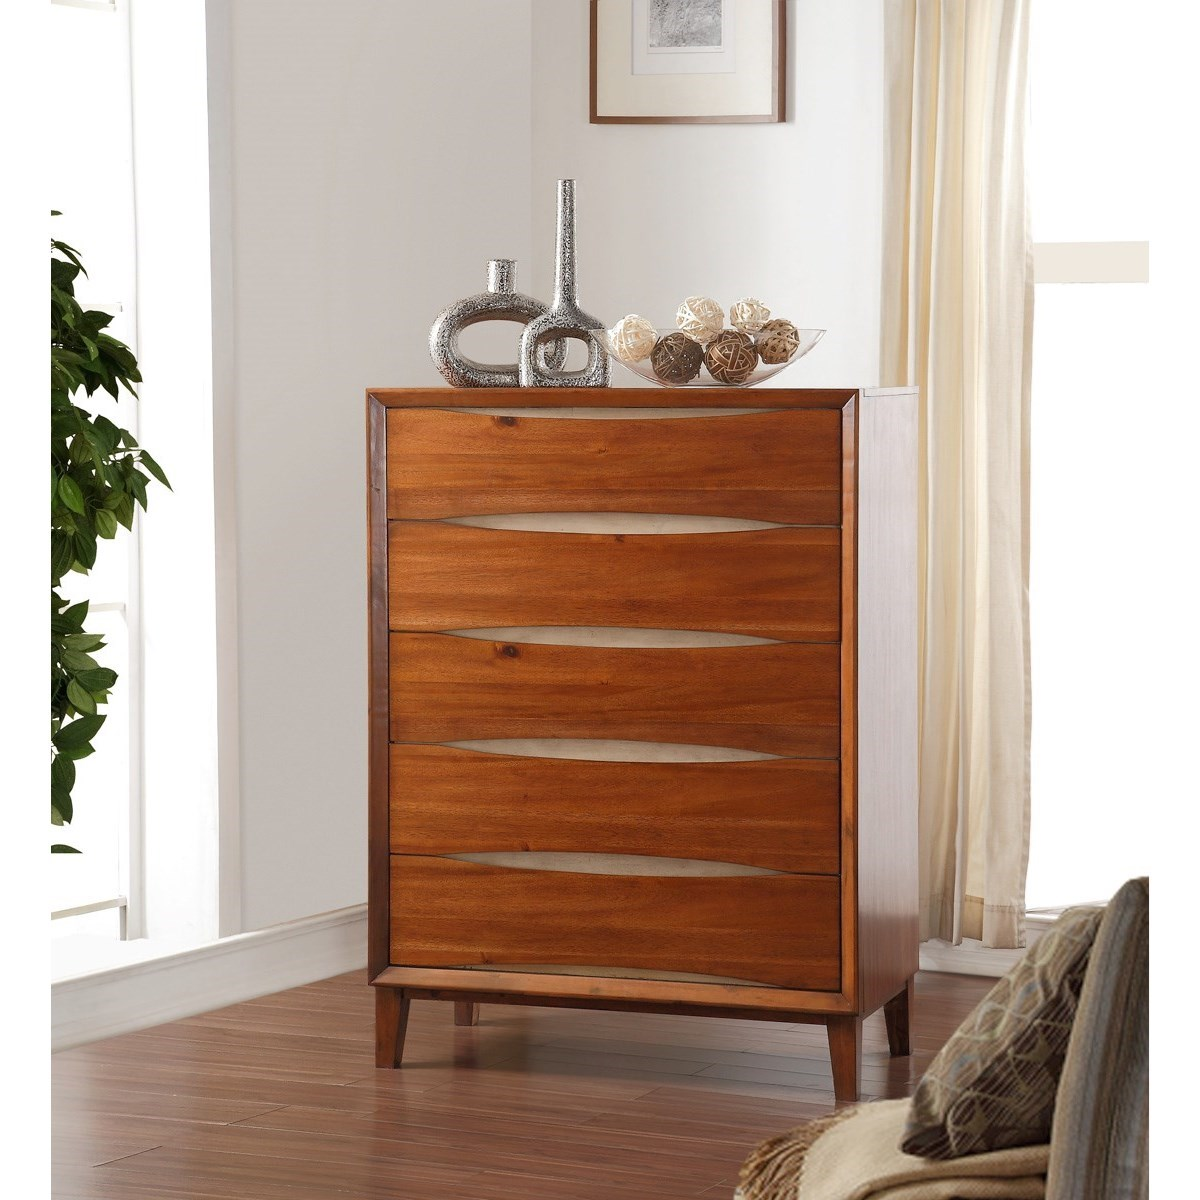 Legends Furniture Evo Evo Chest - Item Number: ZEVO-7016